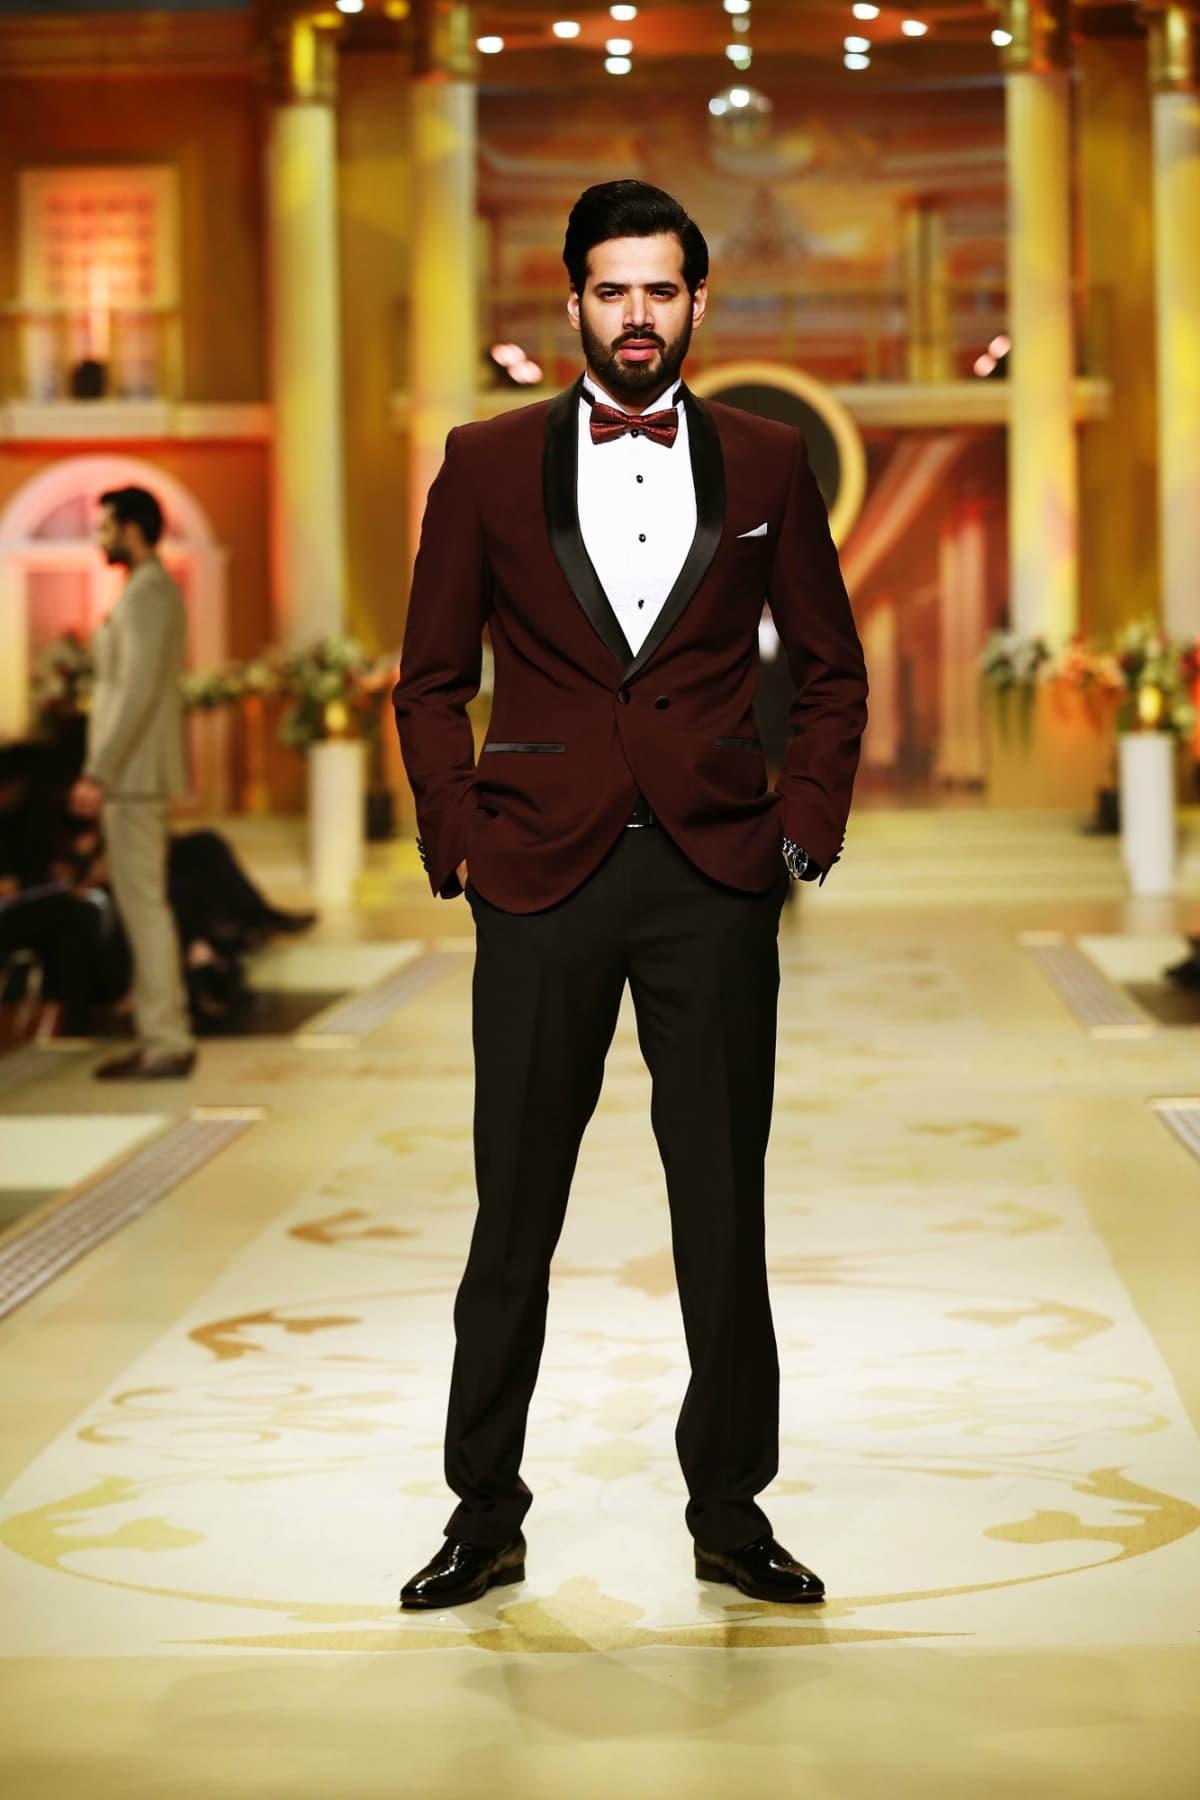 Brown royal tag formal suits for men